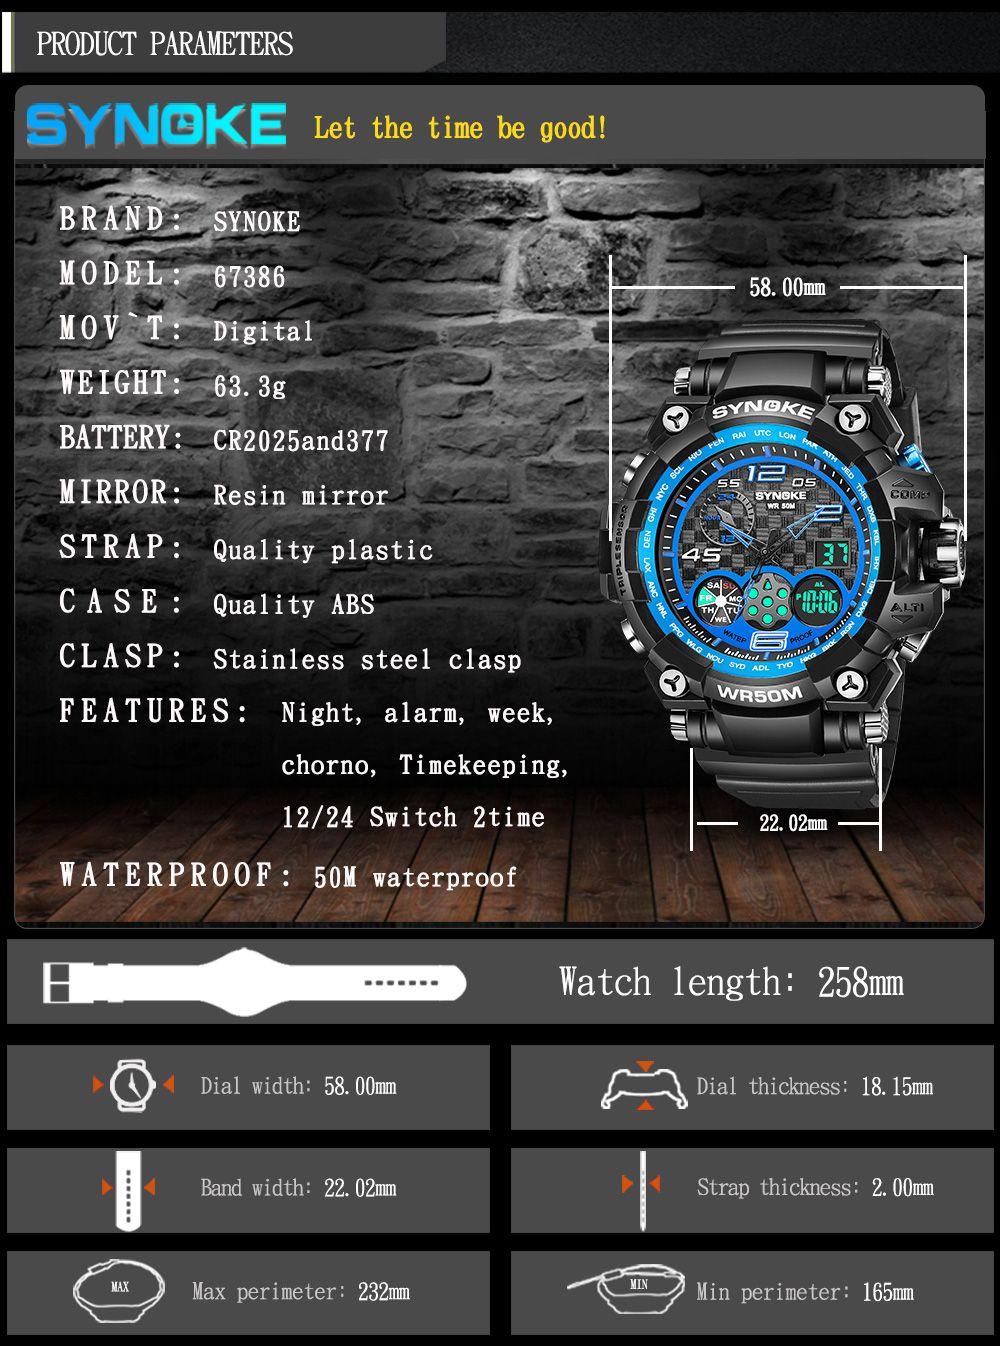 SYNOKE 67386 Trendy Sports Multifunctional Man Watch